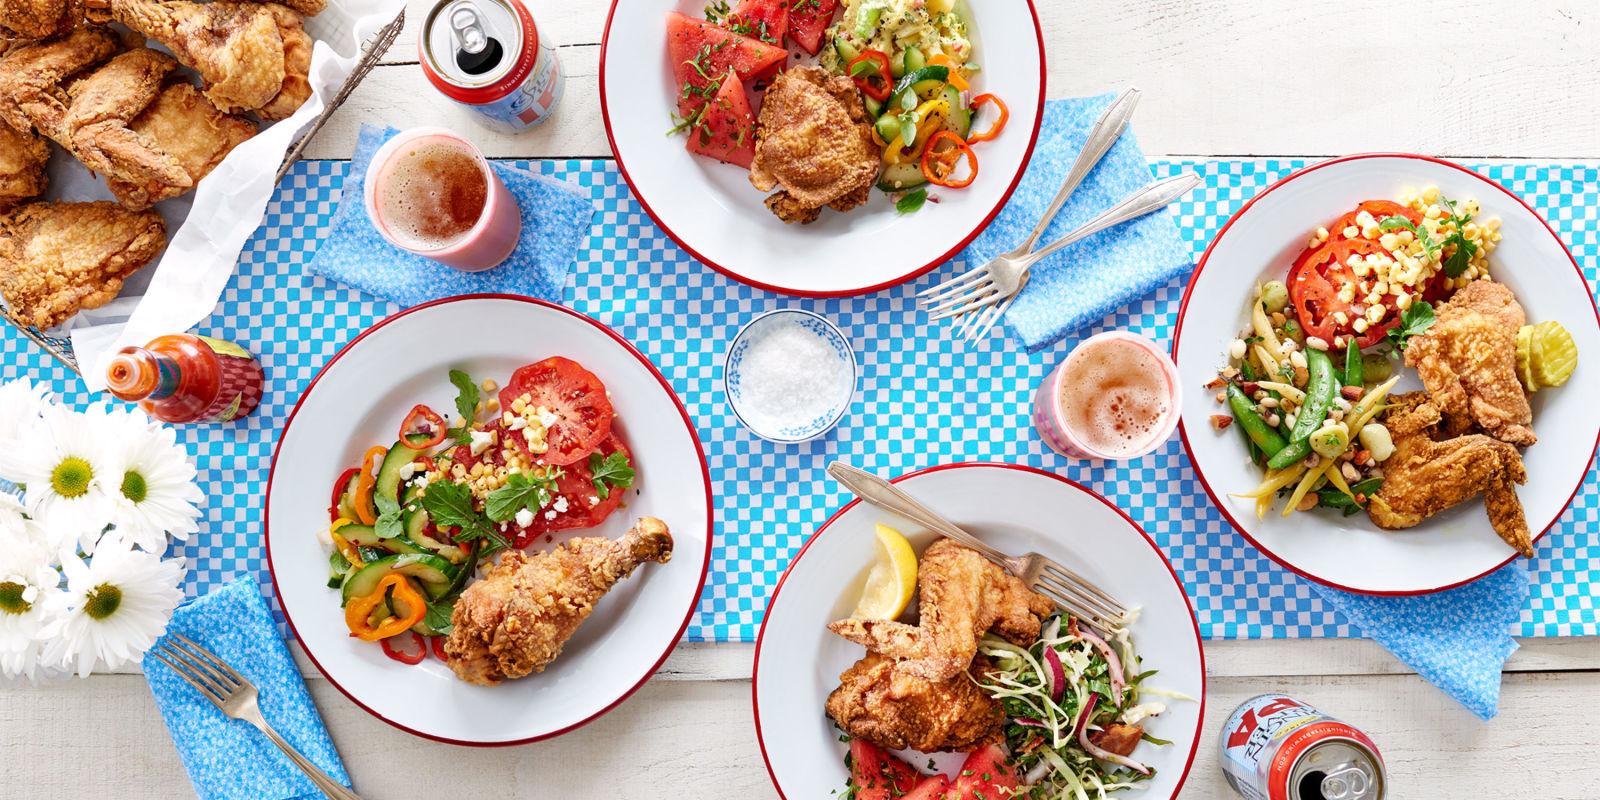 Picnic Dinner Ideas  90 Summer Picnic Recipes – Easy Food Ideas for a Summer